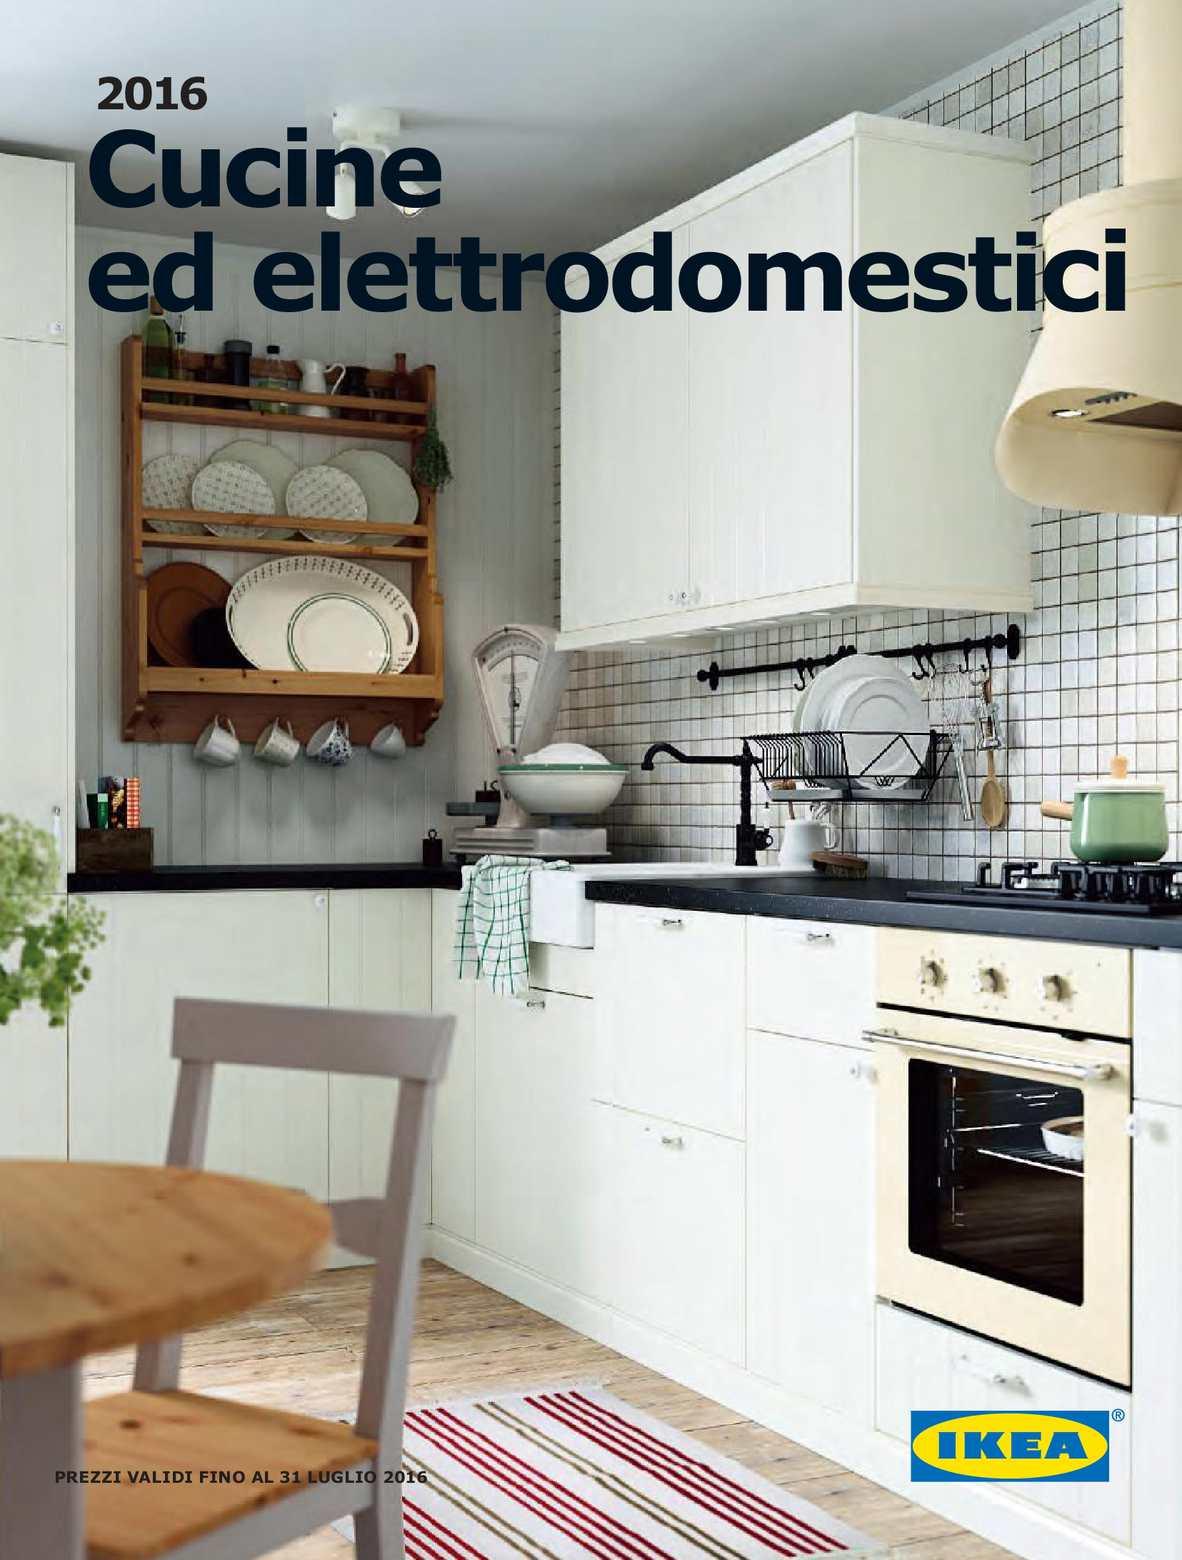 Calam o catalogo ikea cucine ed elettrodomestici fino a - Cucine a gas ikea ...